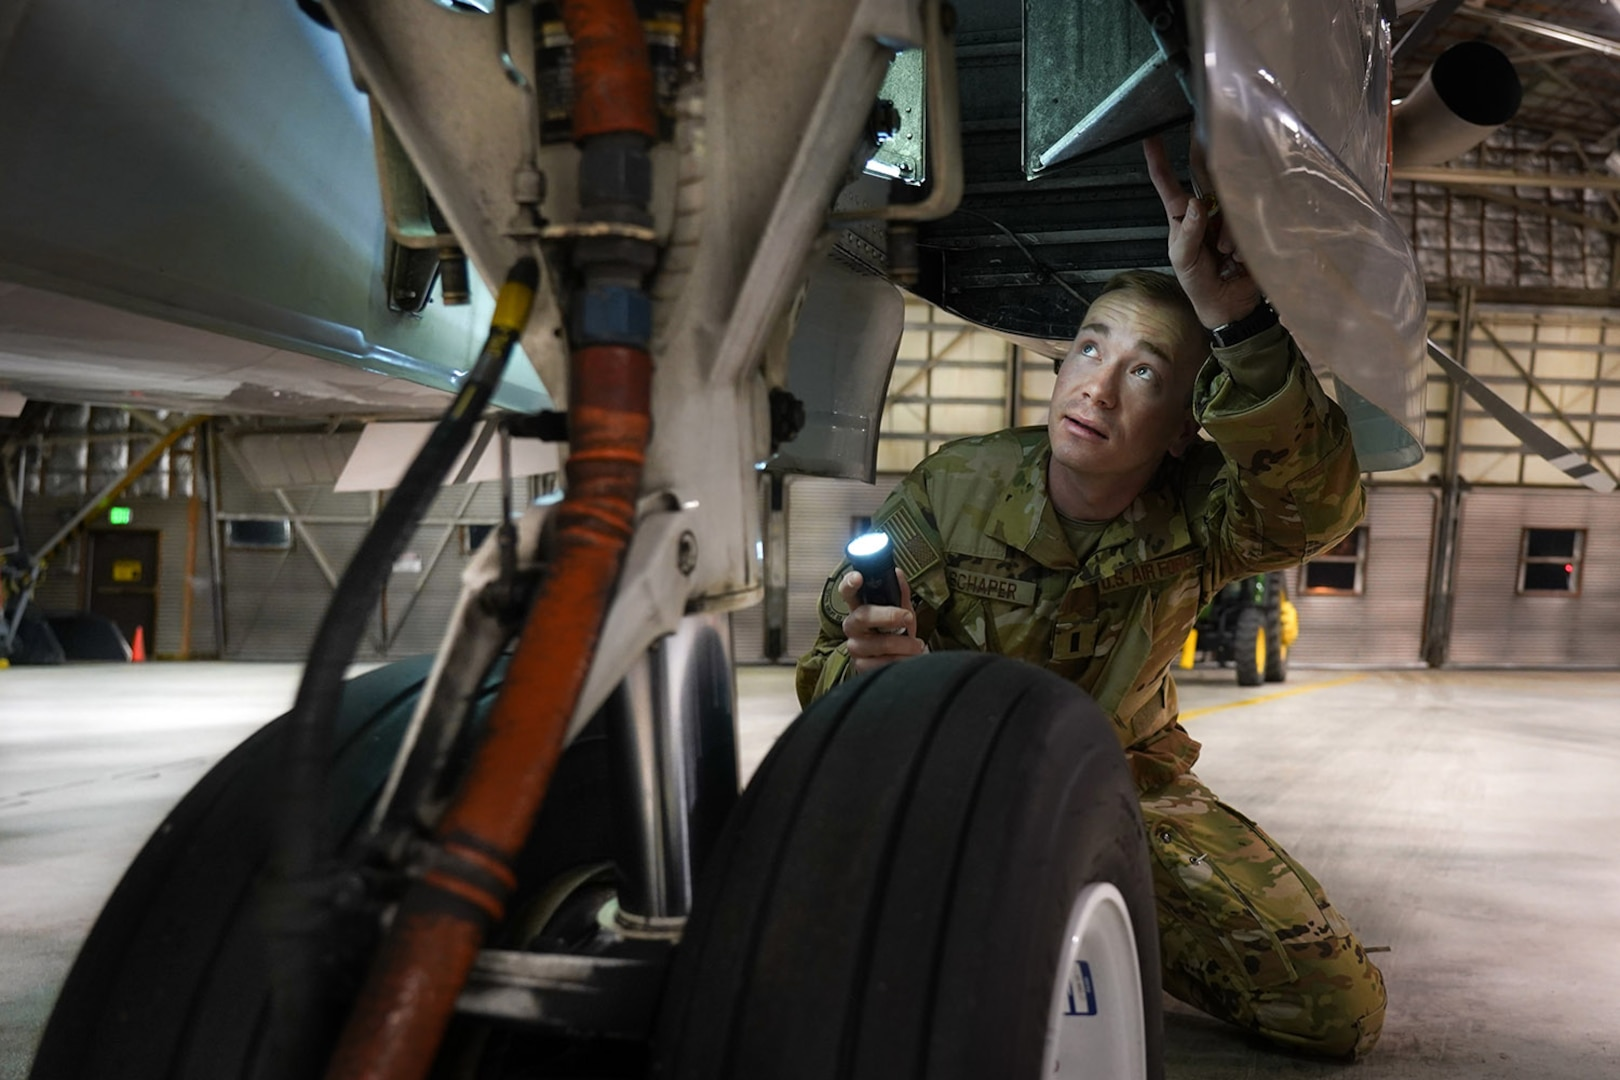 C-12s keep long-range radar sites, remote areas functioning